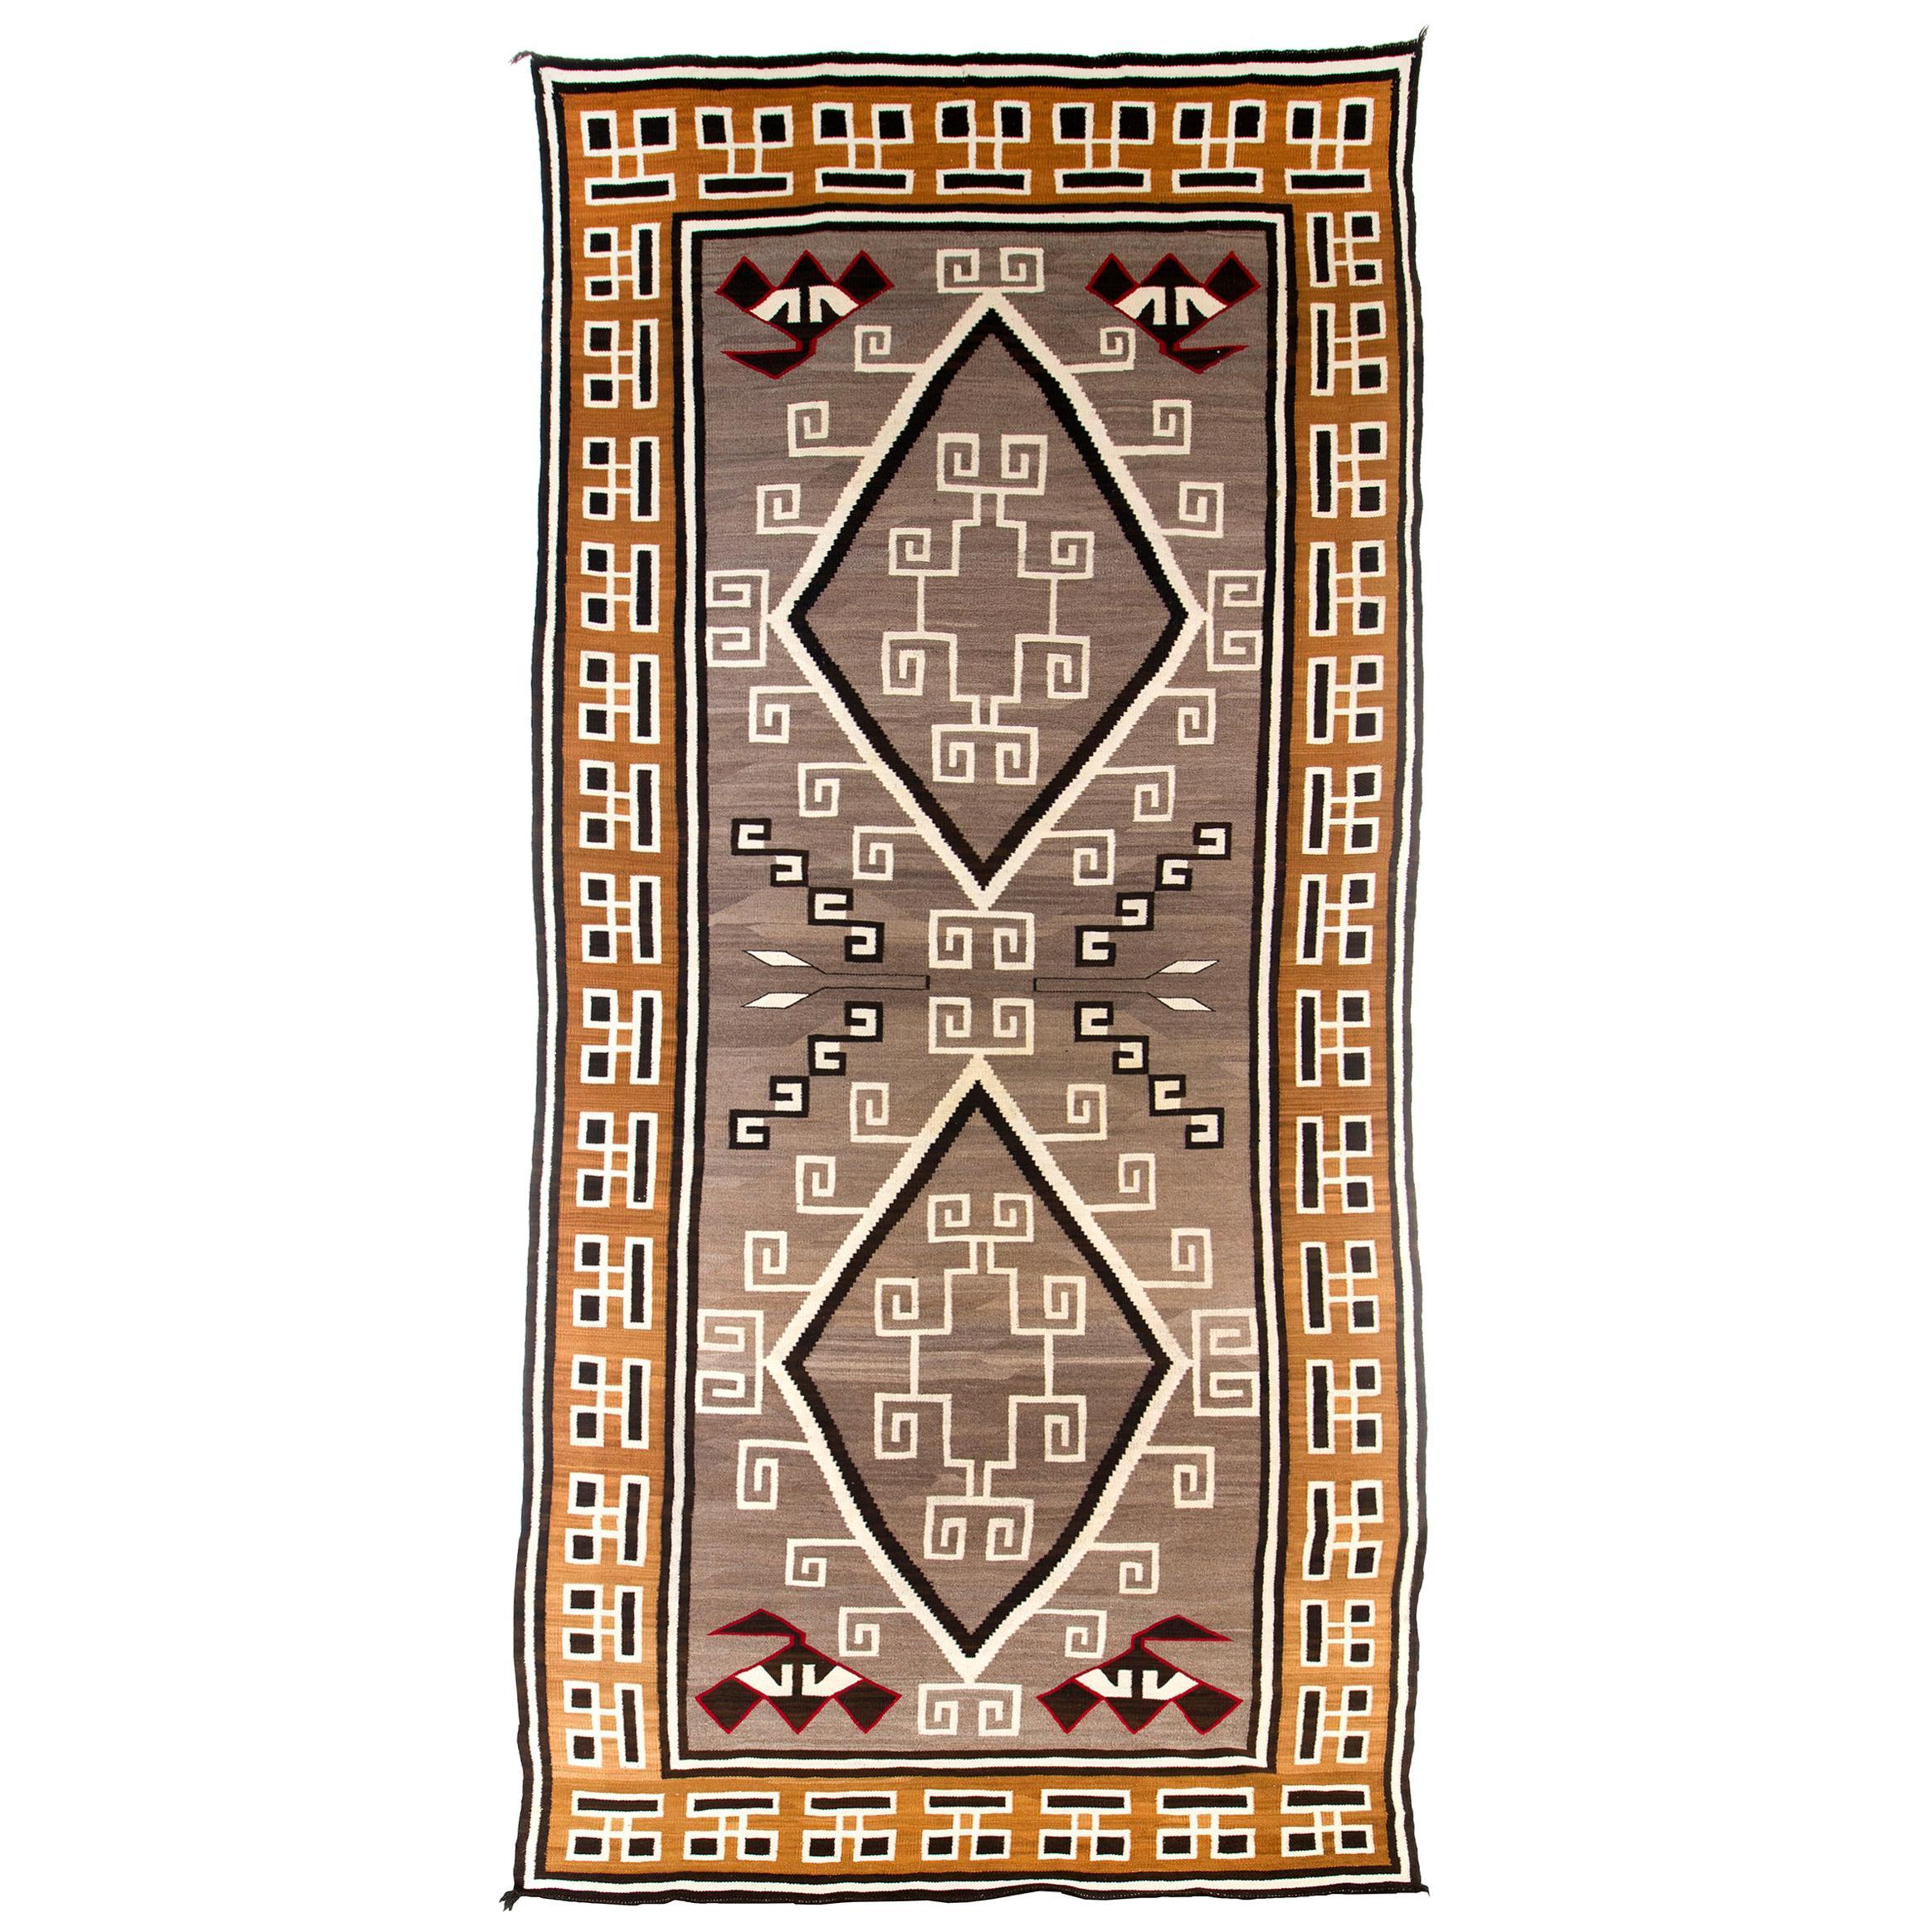 Navajo Rug, Large Area Rug, Vintage 1910s-1920s, Crystal Ganado Trading Post